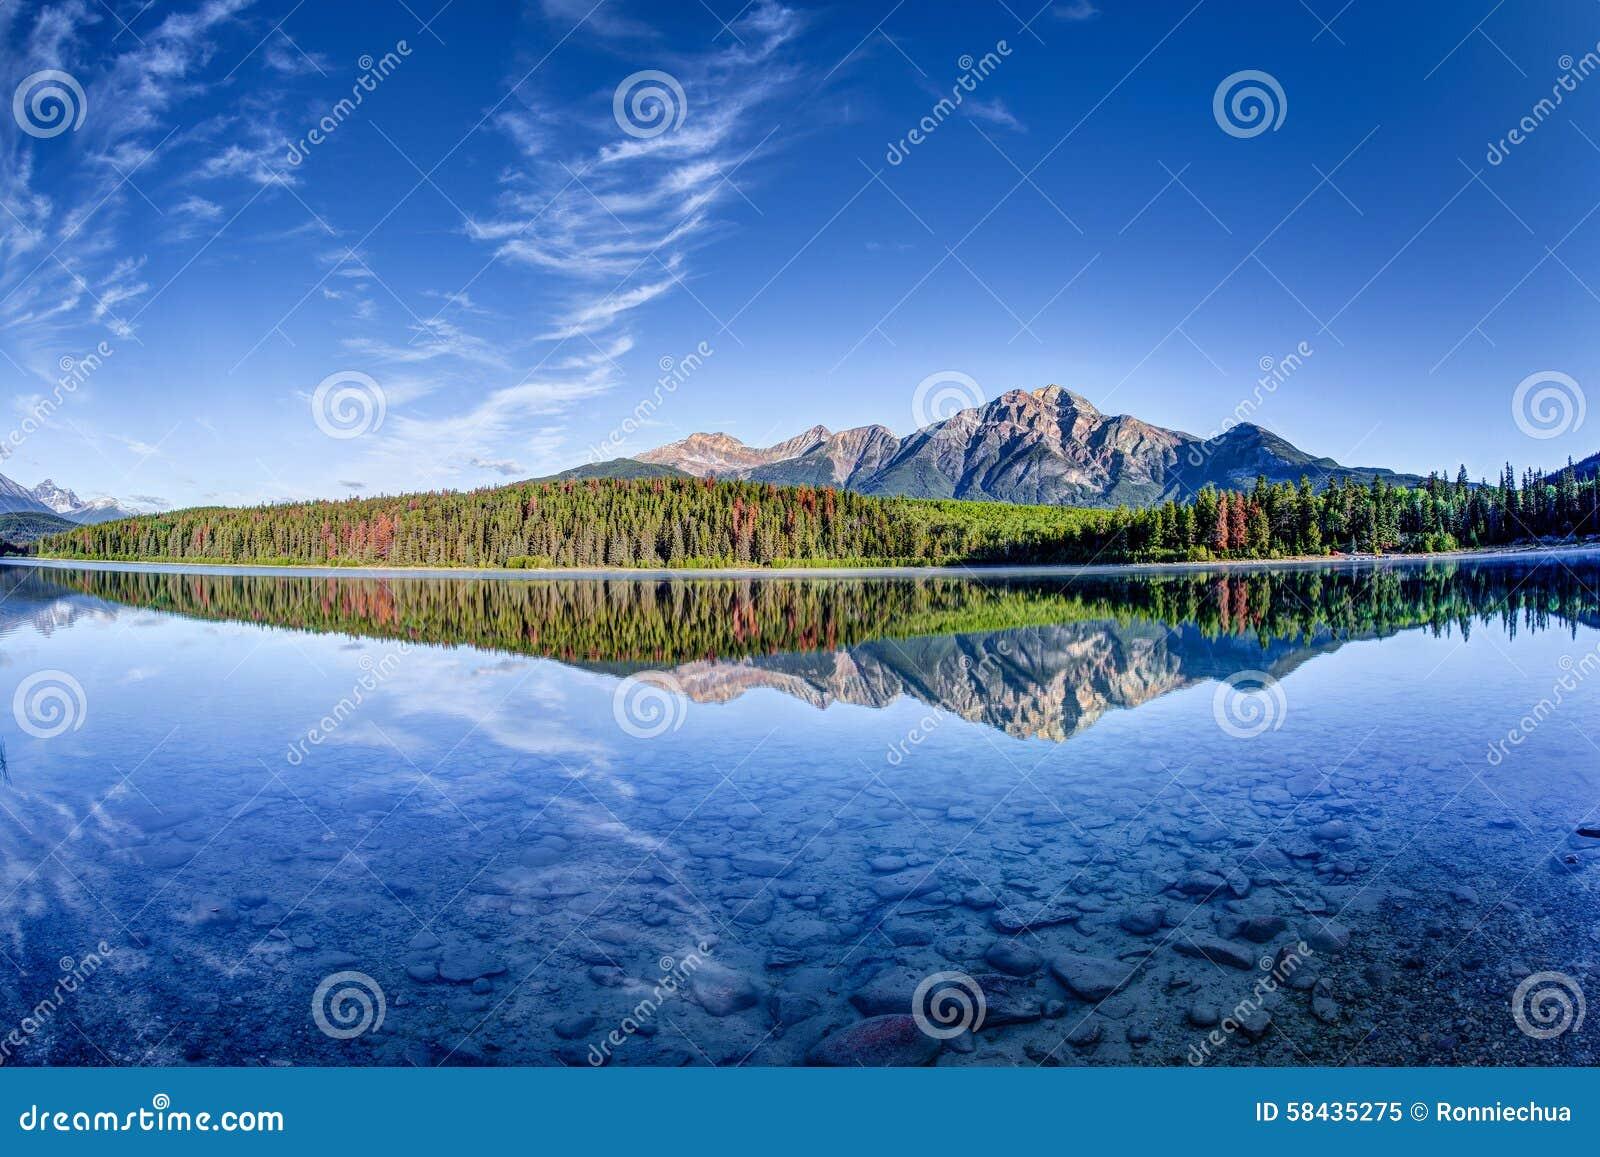 Kanadische Landschaft: Patricia Lake bei Jasper National Park